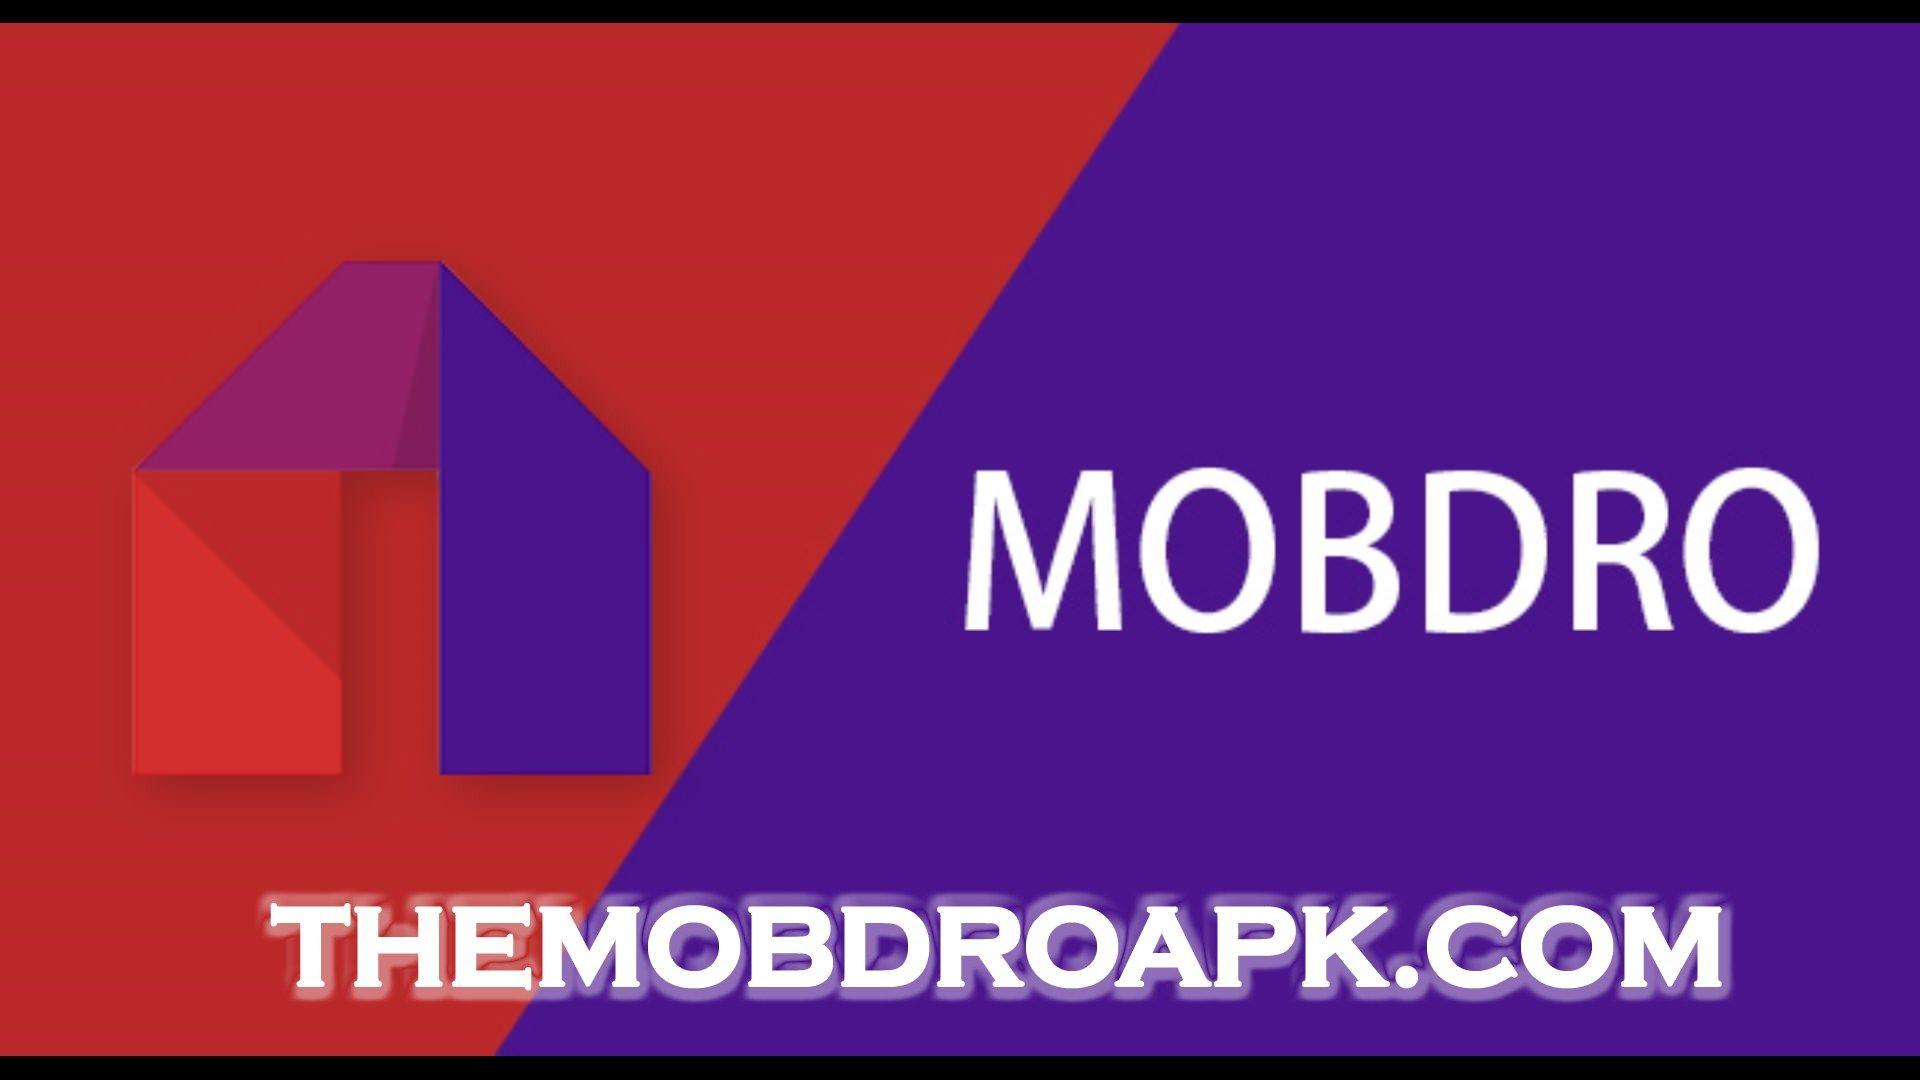 Mobdro Premium Apk Cracked Installmobdroapp Mobdroapkmirror Mobdroapkforsmarttv Mobdrohdapk Mobdroapkuptodown Spotify Premium Download App Watch Tv Online